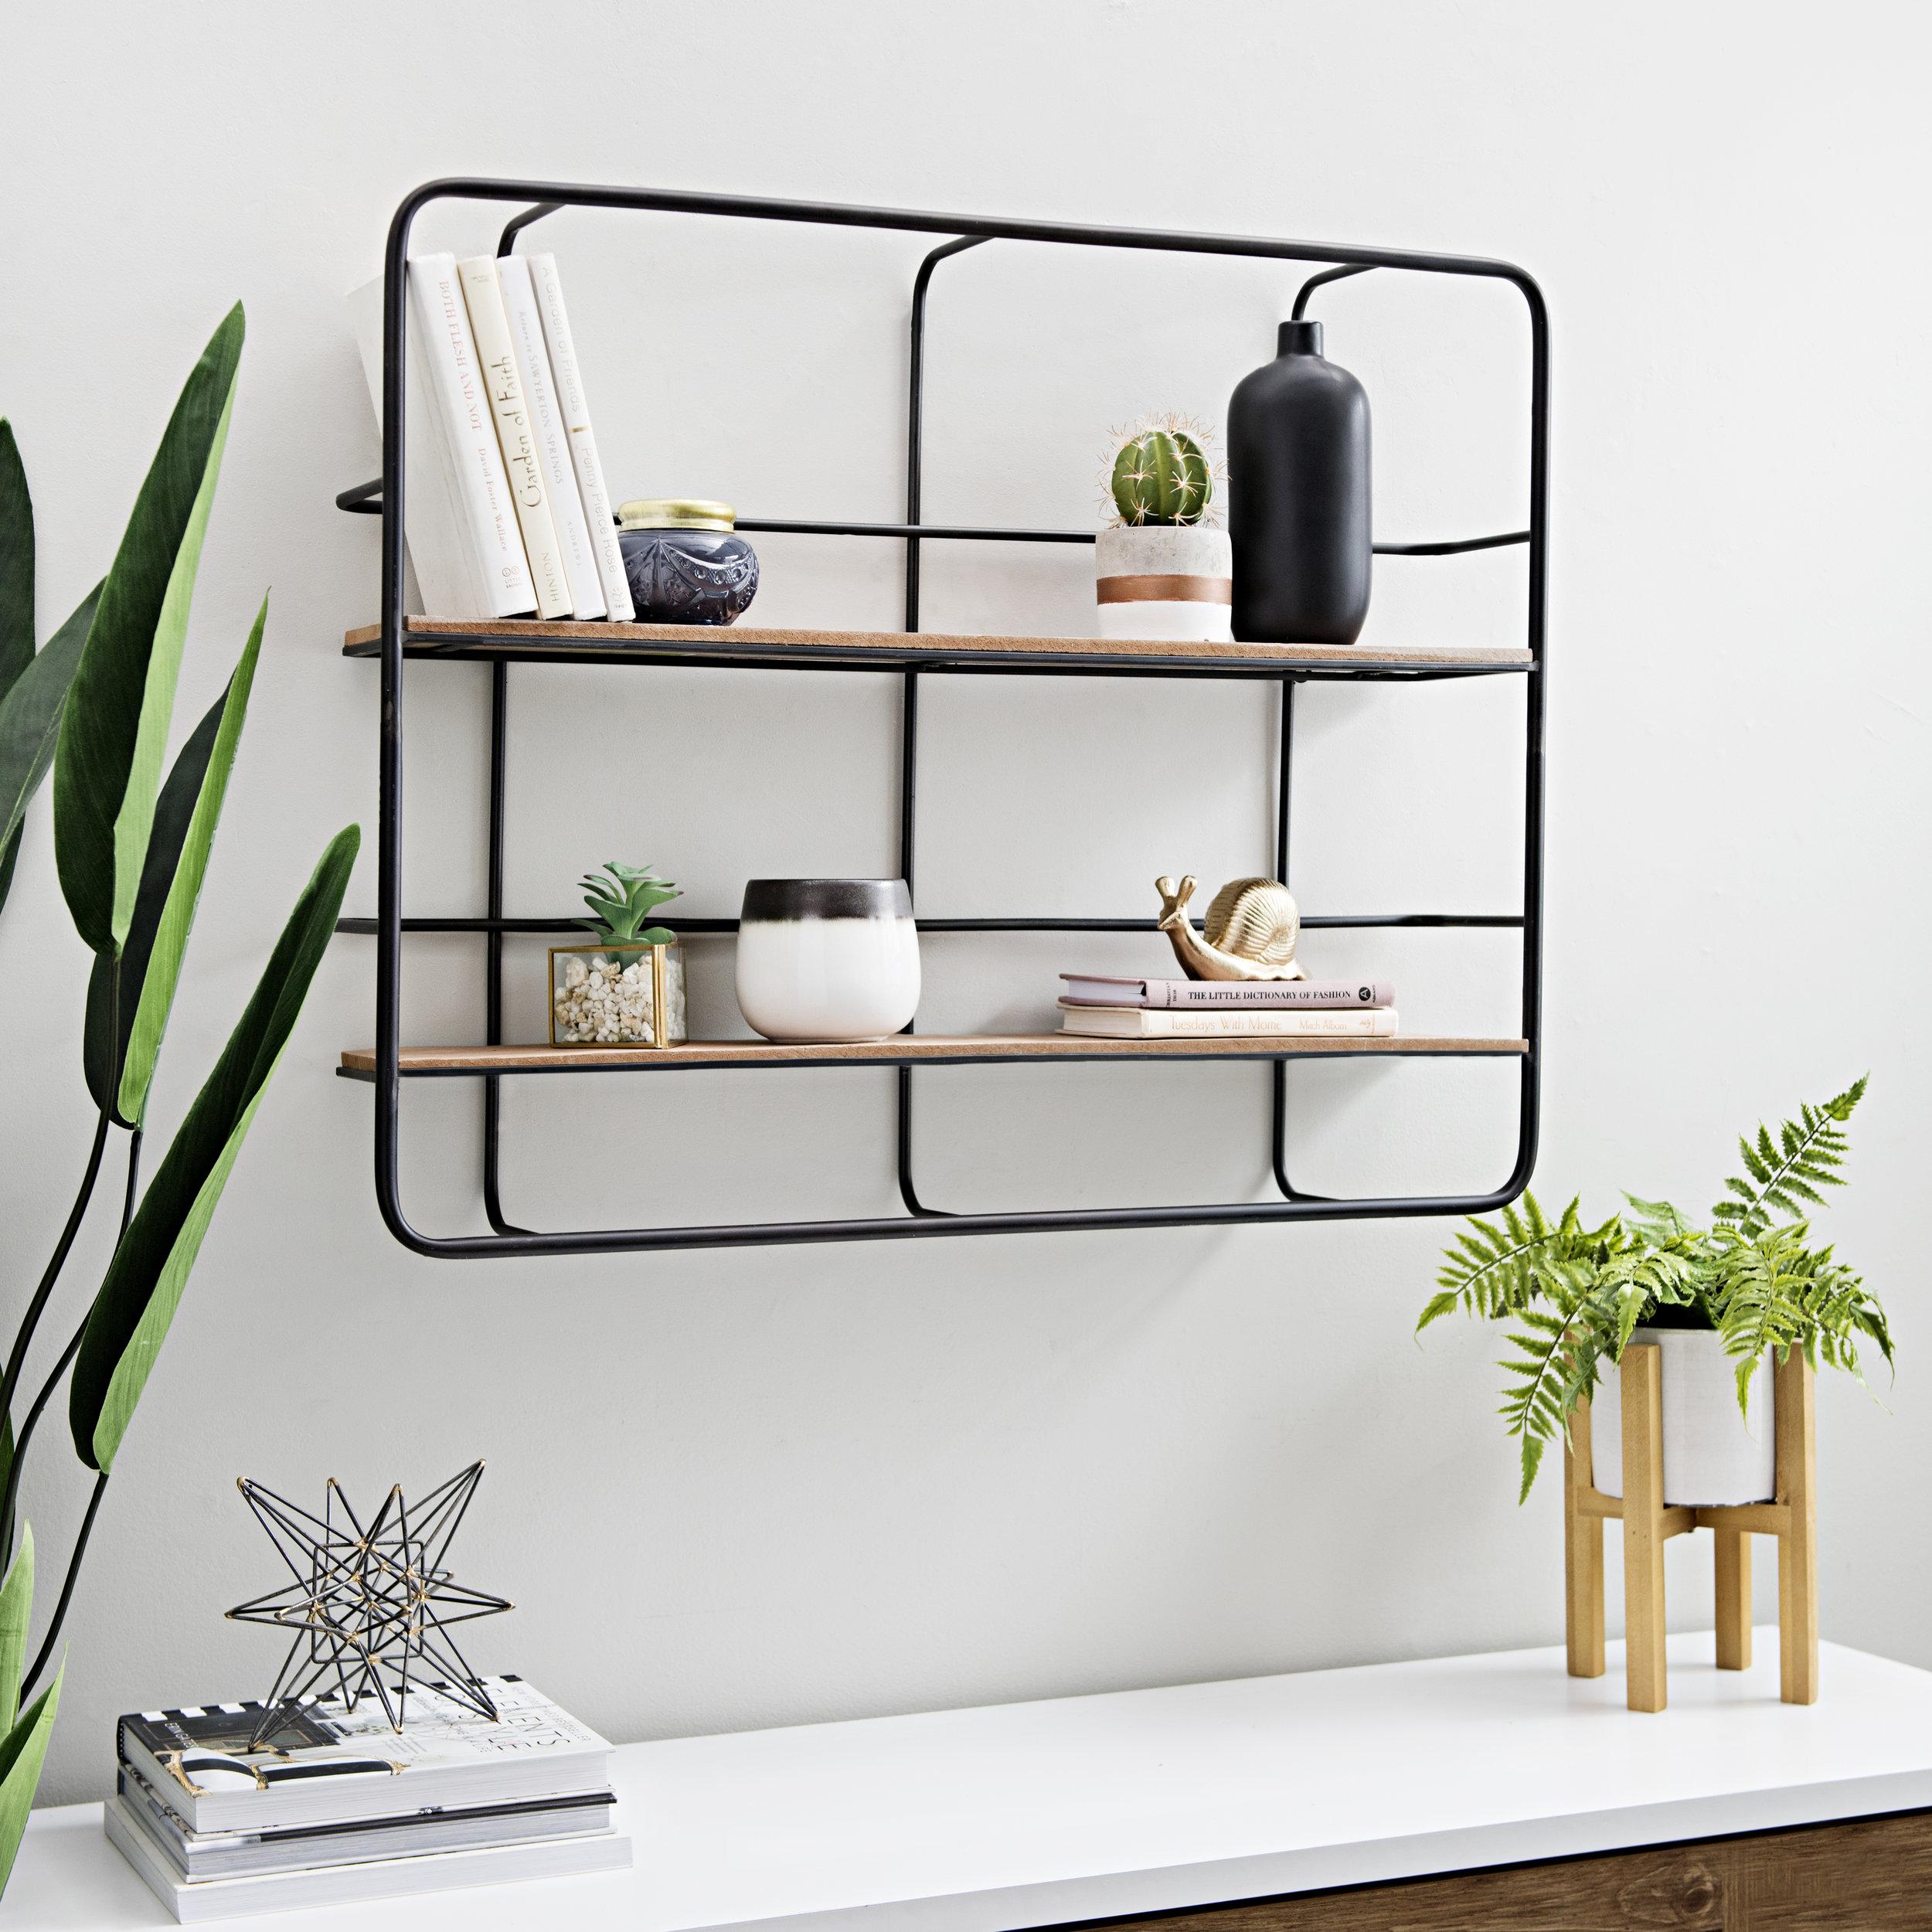 Kirkland's - Wood Double Wall Shelves on Metal Back Grid